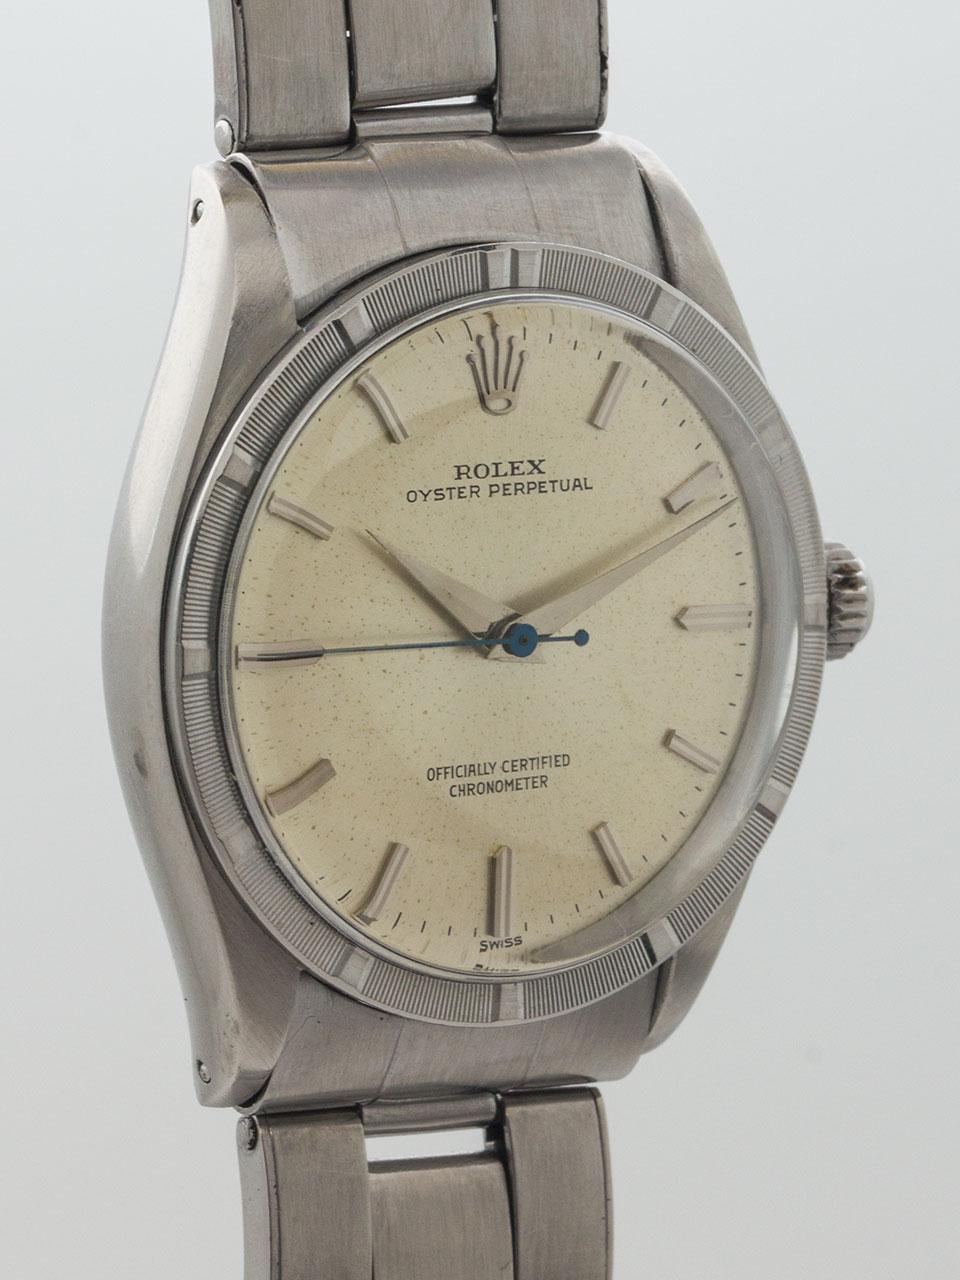 Rolex Oyster Perpetual ref 6569 circa 1957